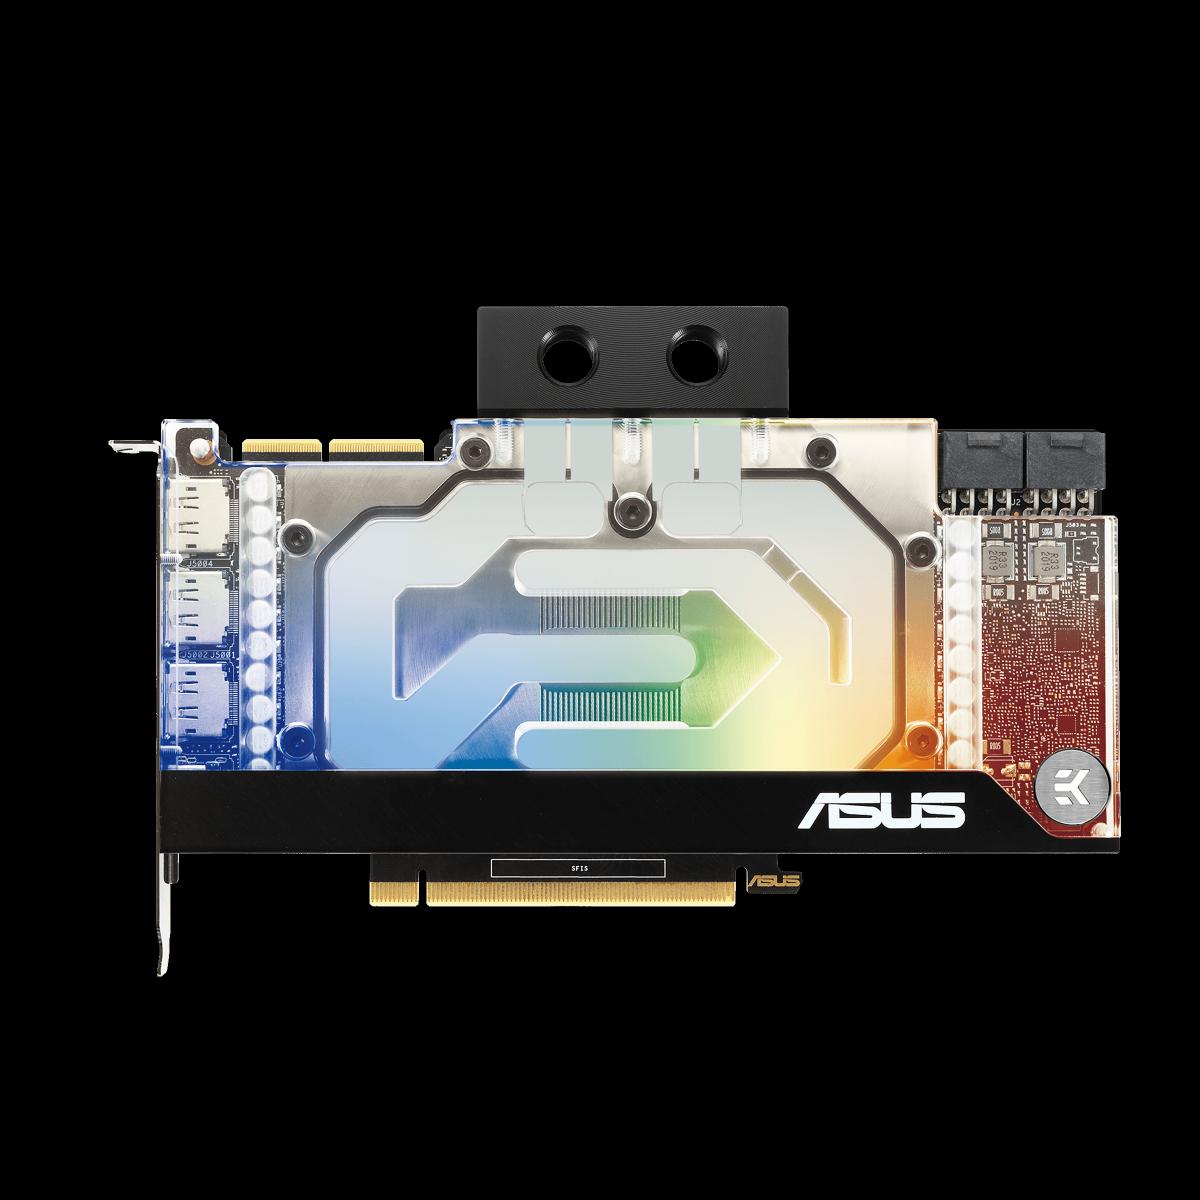 Placa de Vídeo ASUS EKWB GeForce RTX 3090, 24GB, GDDR6X, 384bit, RTX3090-24G-EK